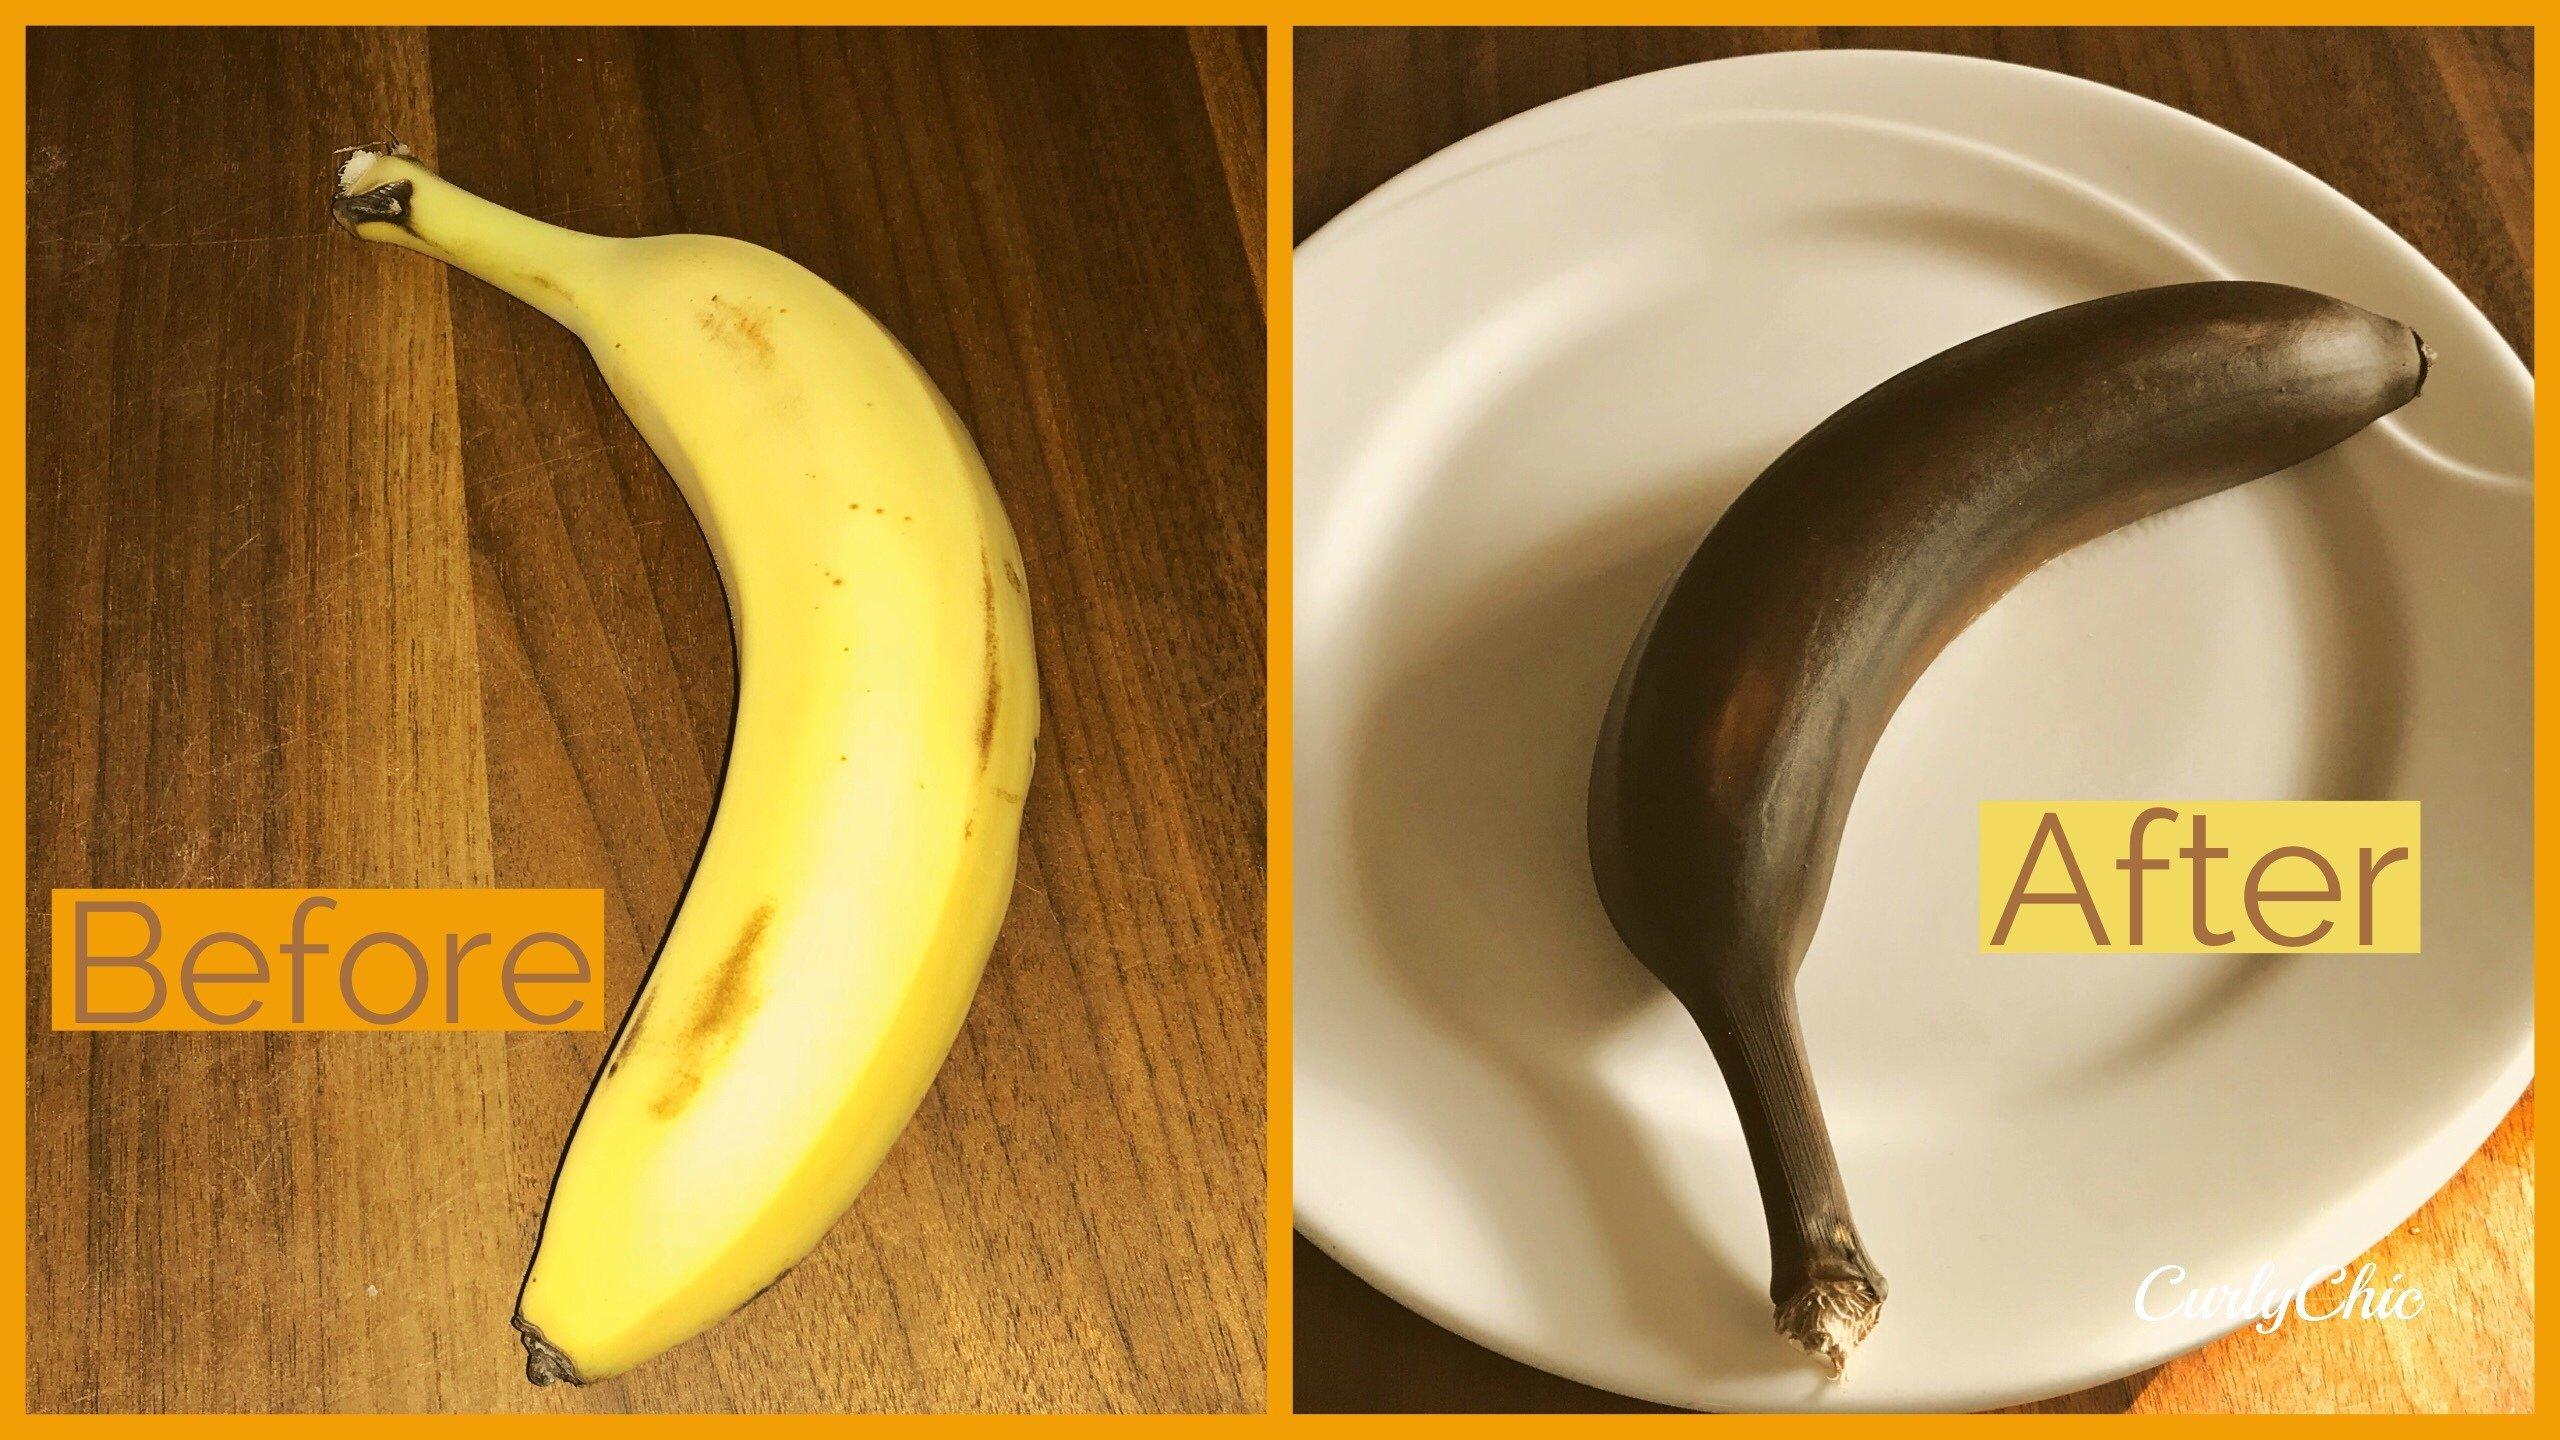 Quickly ripen banans